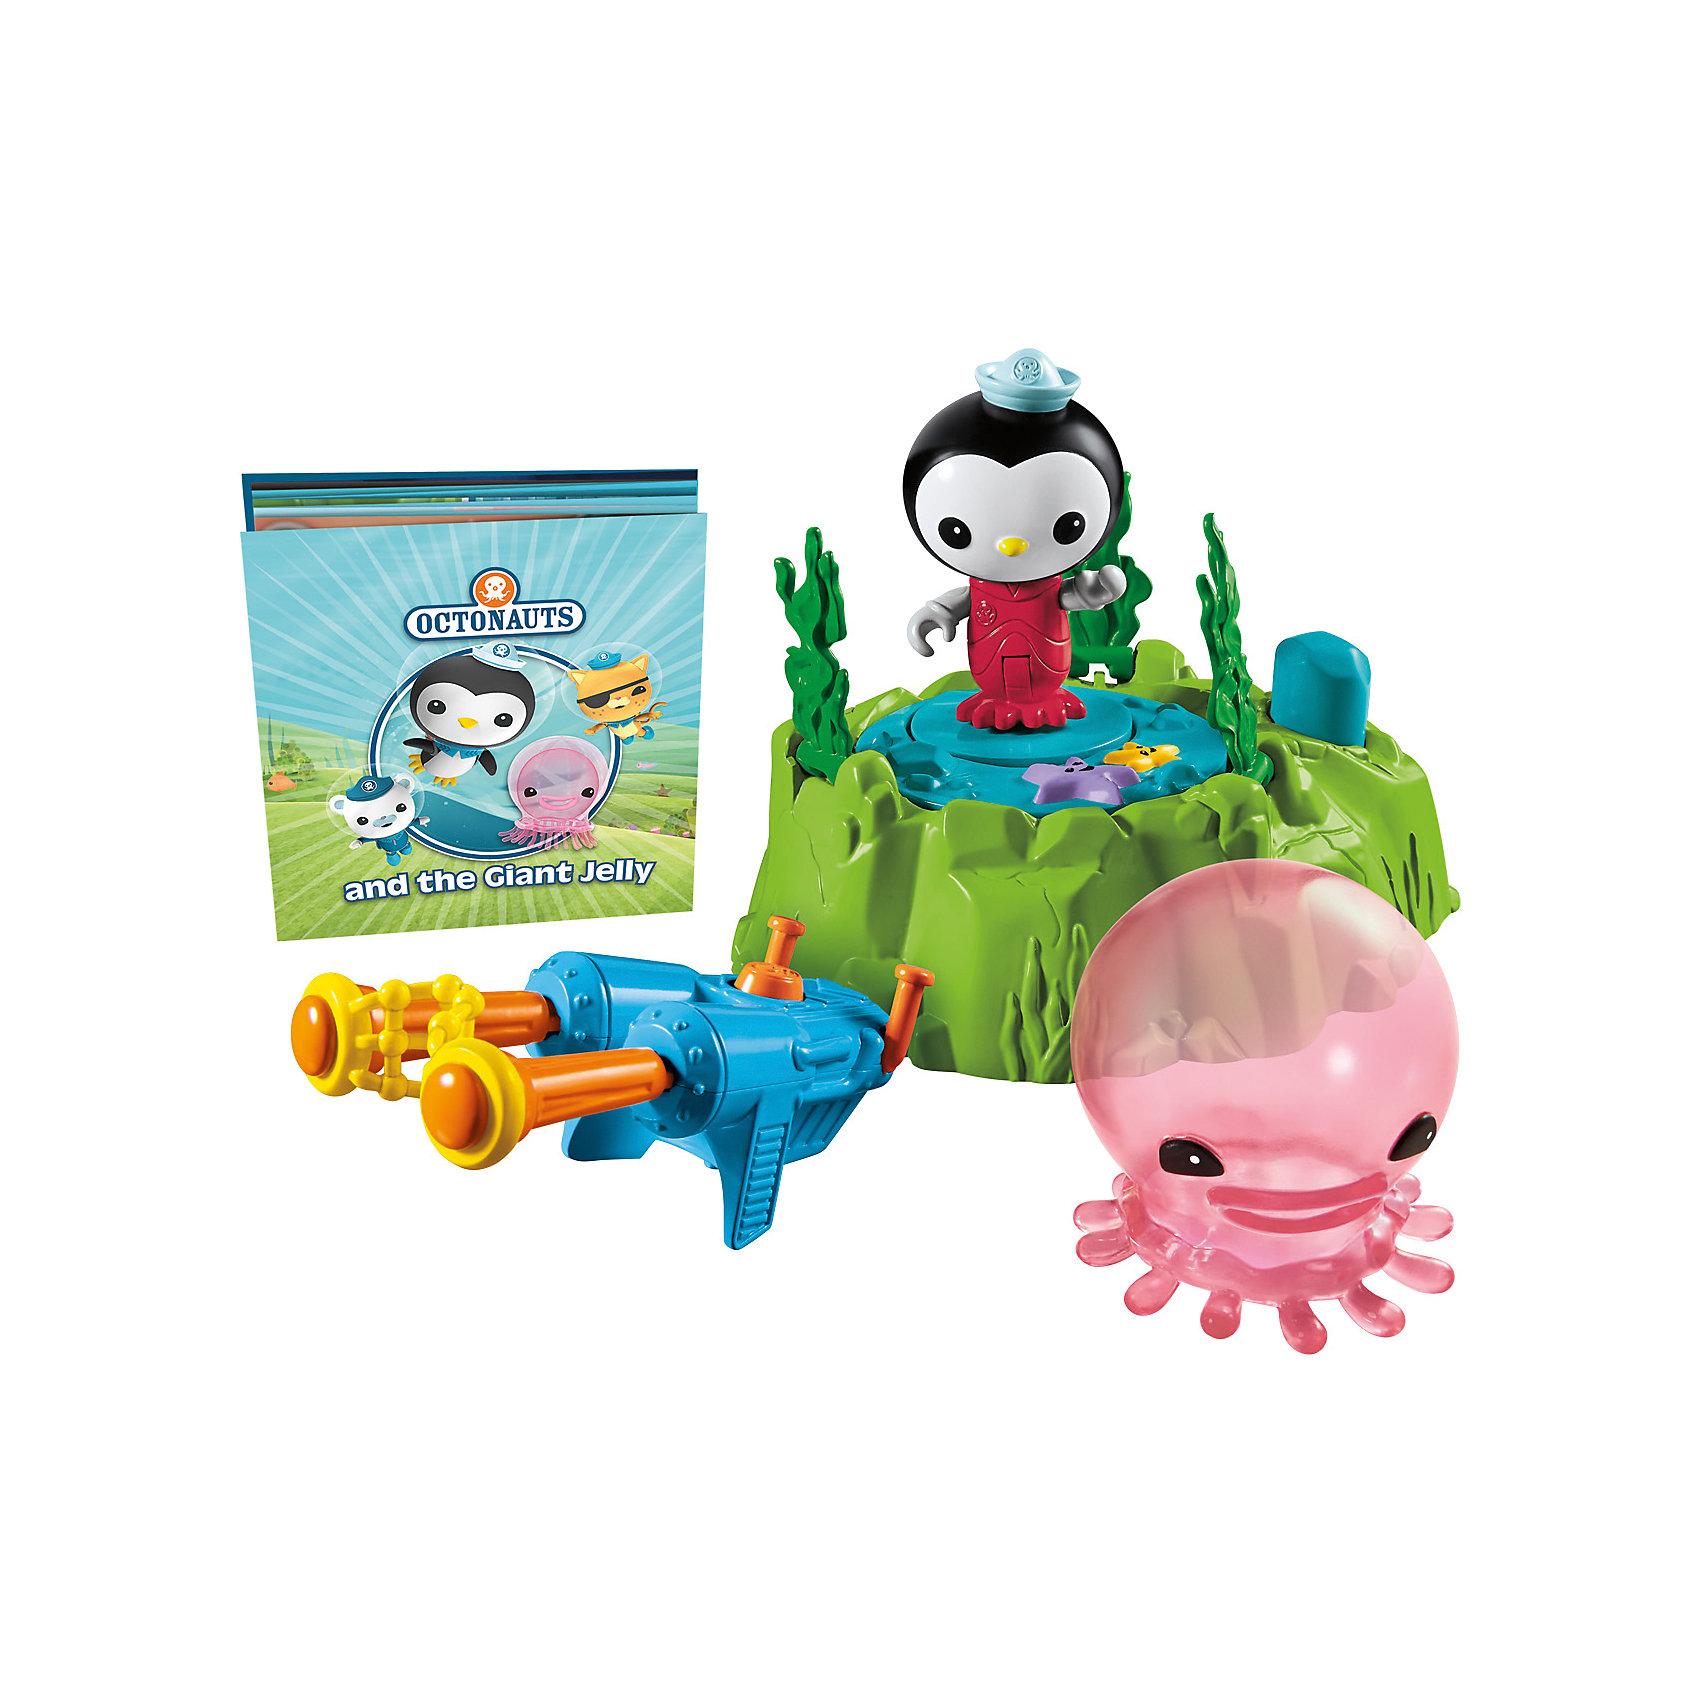 Mattel Набор фигурок с транспортом, Октонавты, Fisher Price